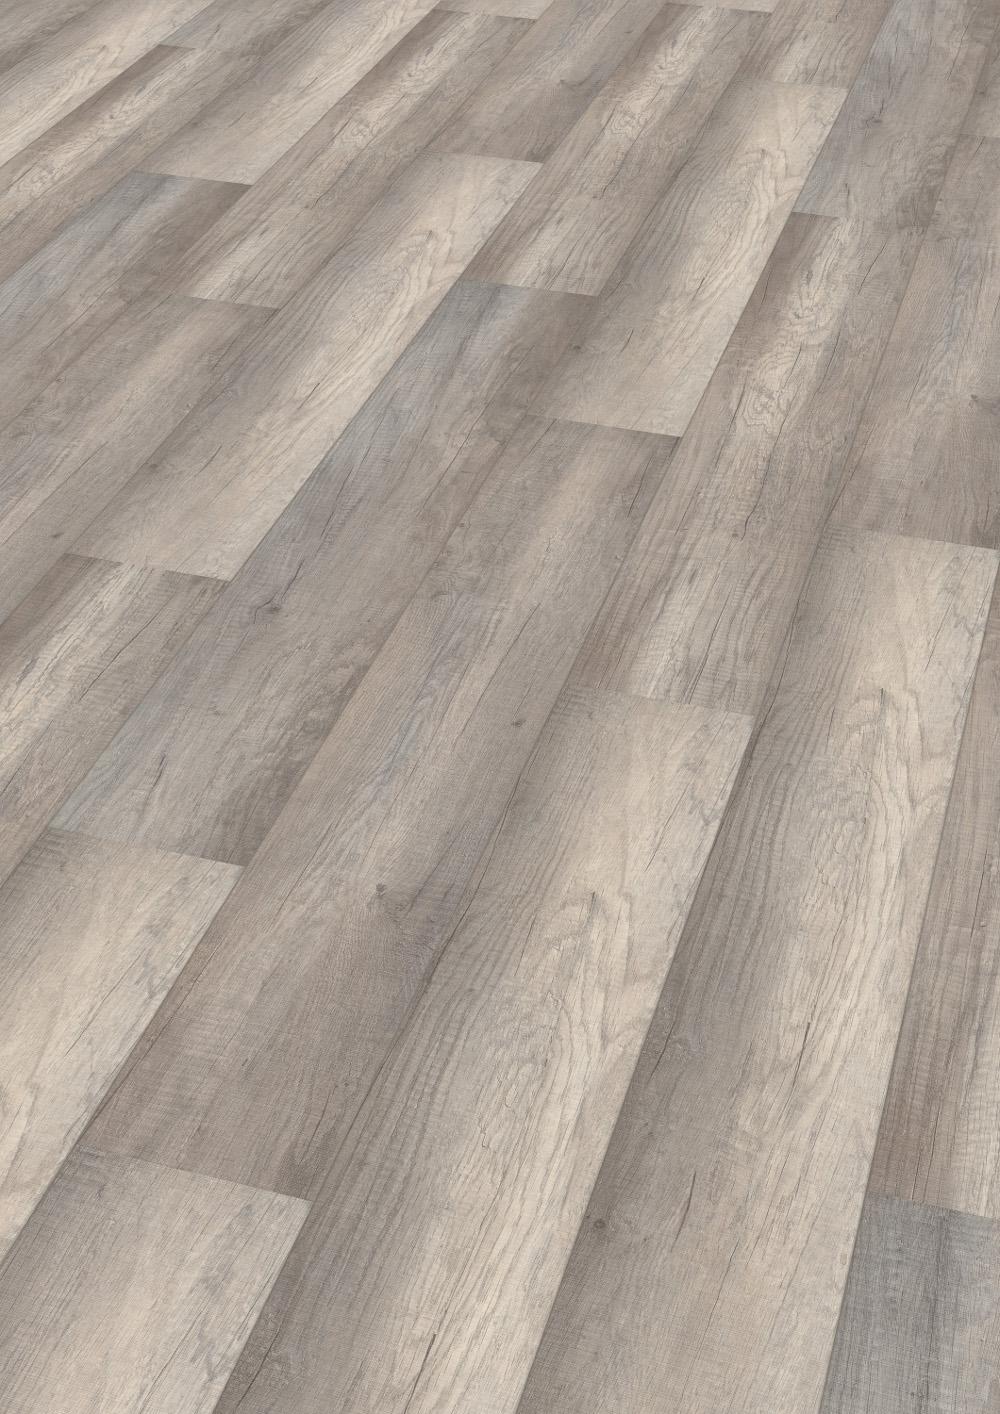 wineo laminat washed oak 1 stab wineo 500 medium v2. Black Bedroom Furniture Sets. Home Design Ideas